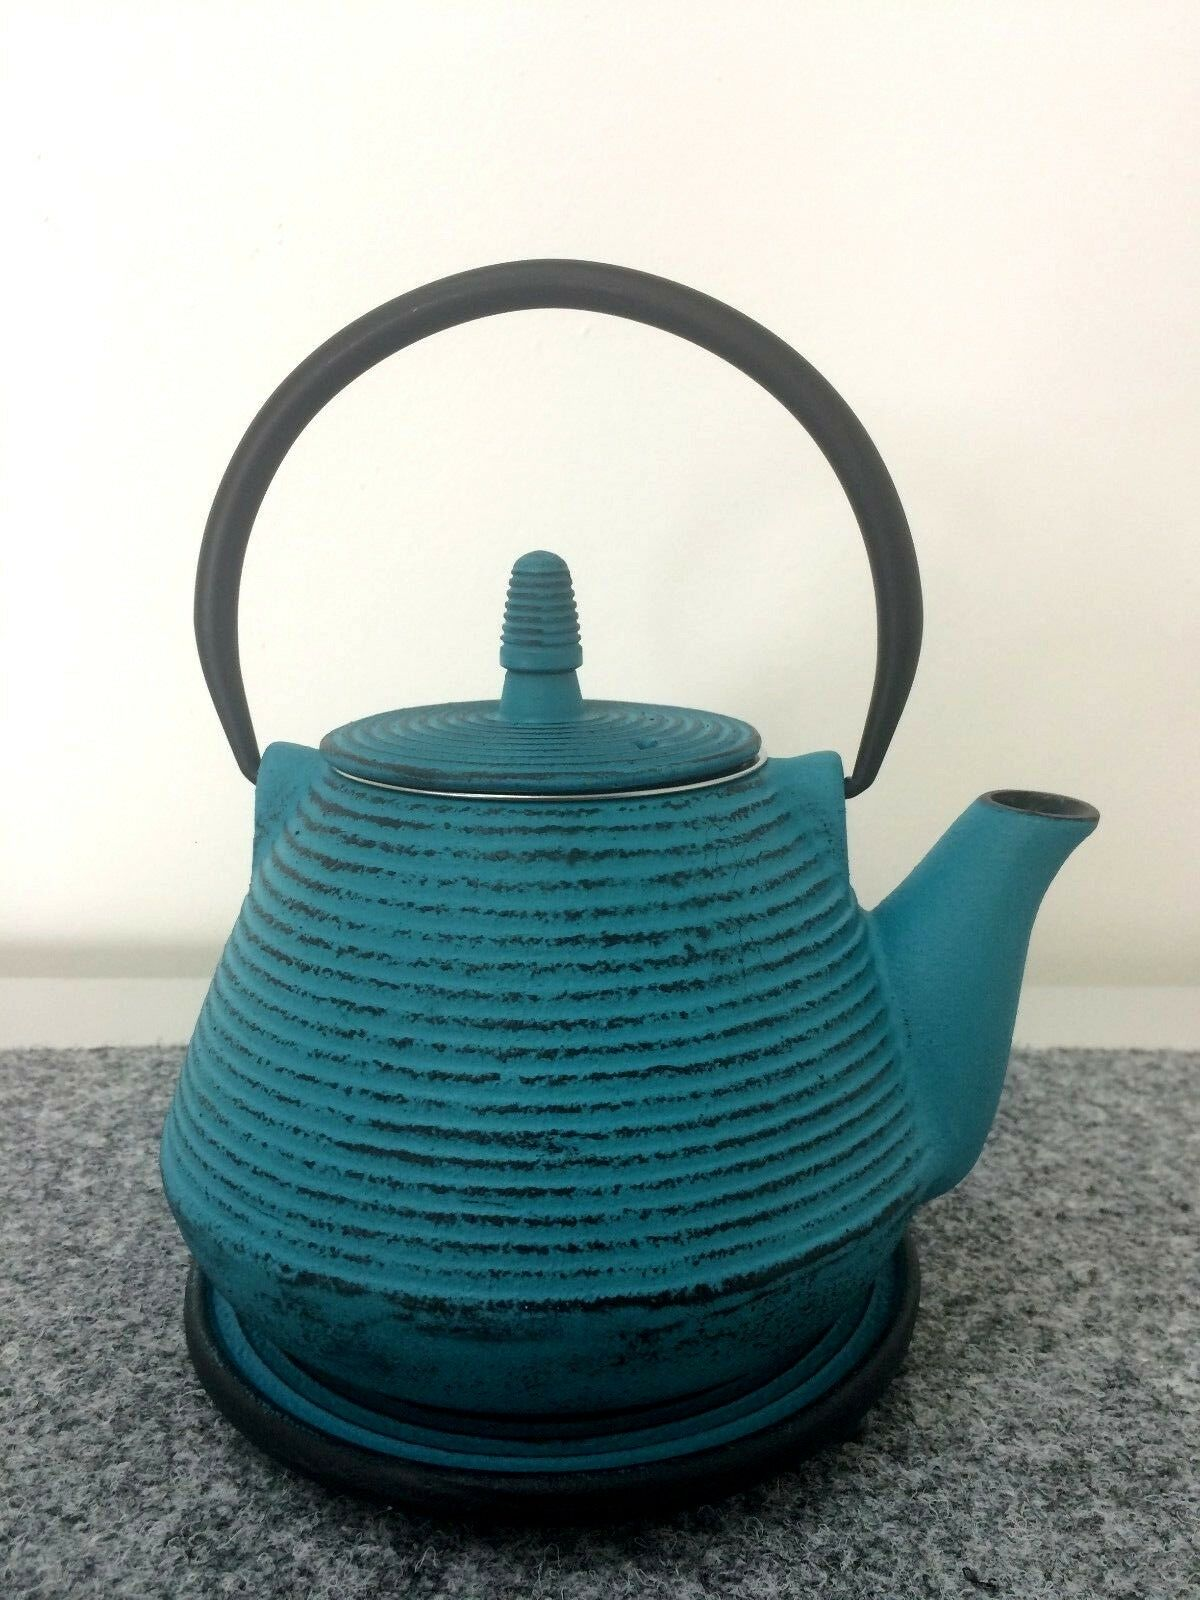 Set Teekanne Gusseisen hält lange warm kalt 1l Teesieb Untersetzer türkis Soße